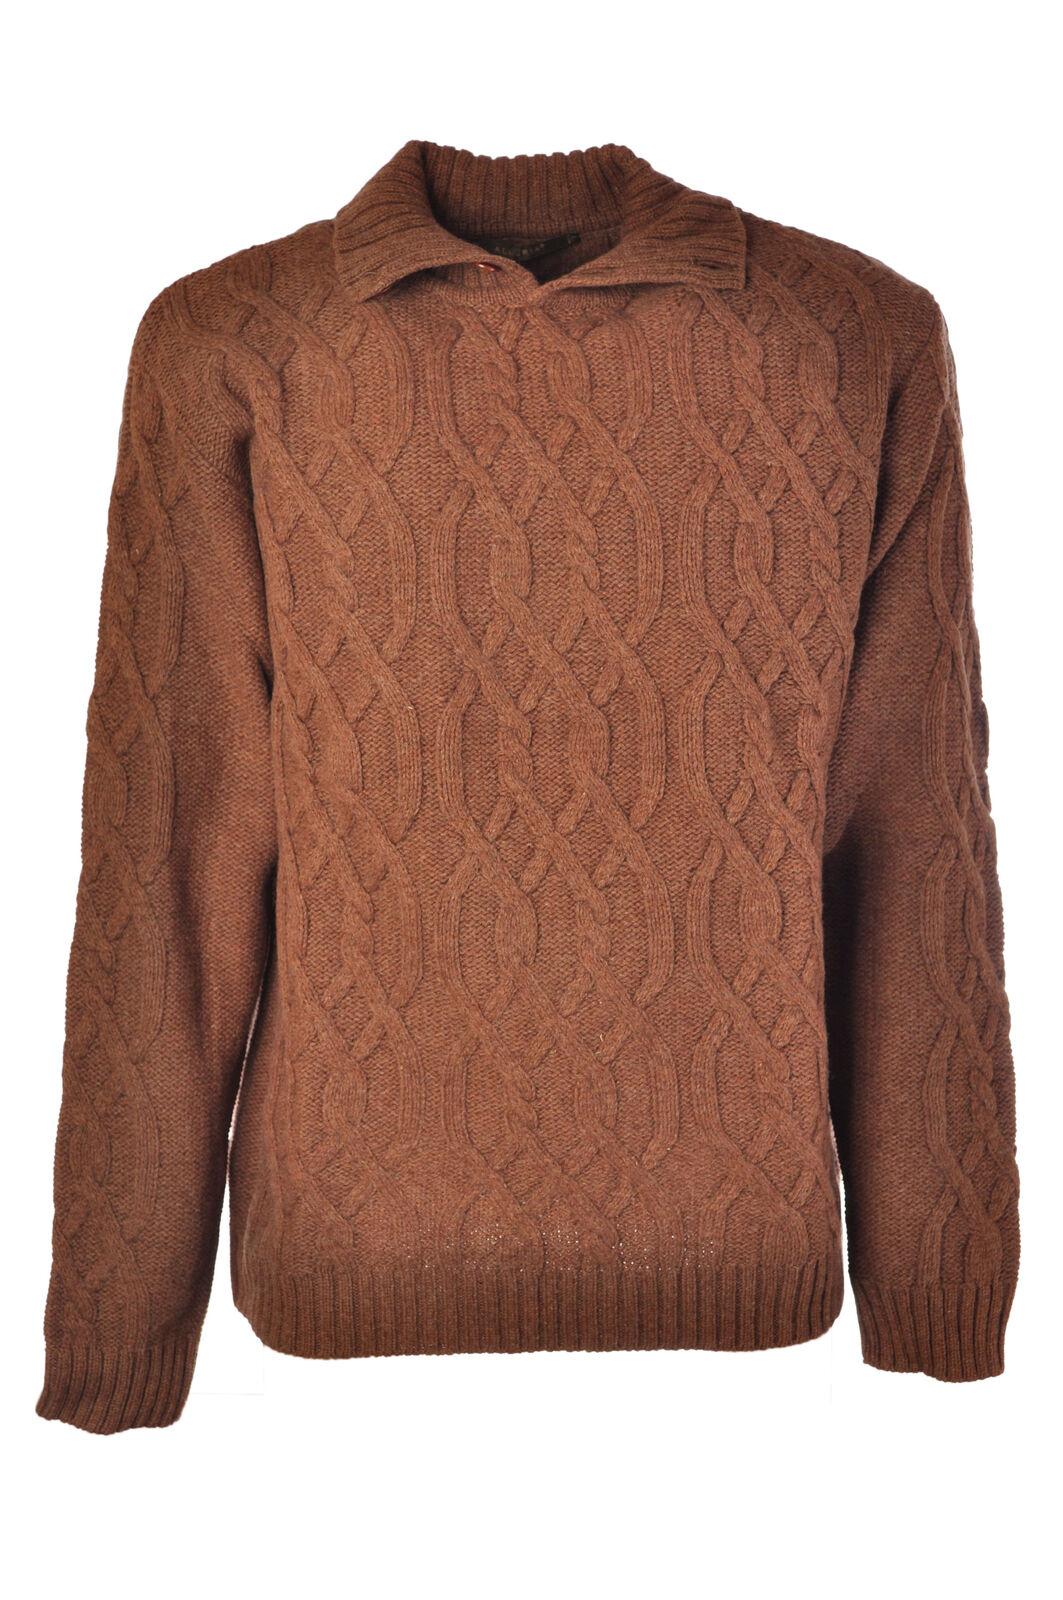 Almeria  -  Sweaters - Male - Brown - 2831931N173550